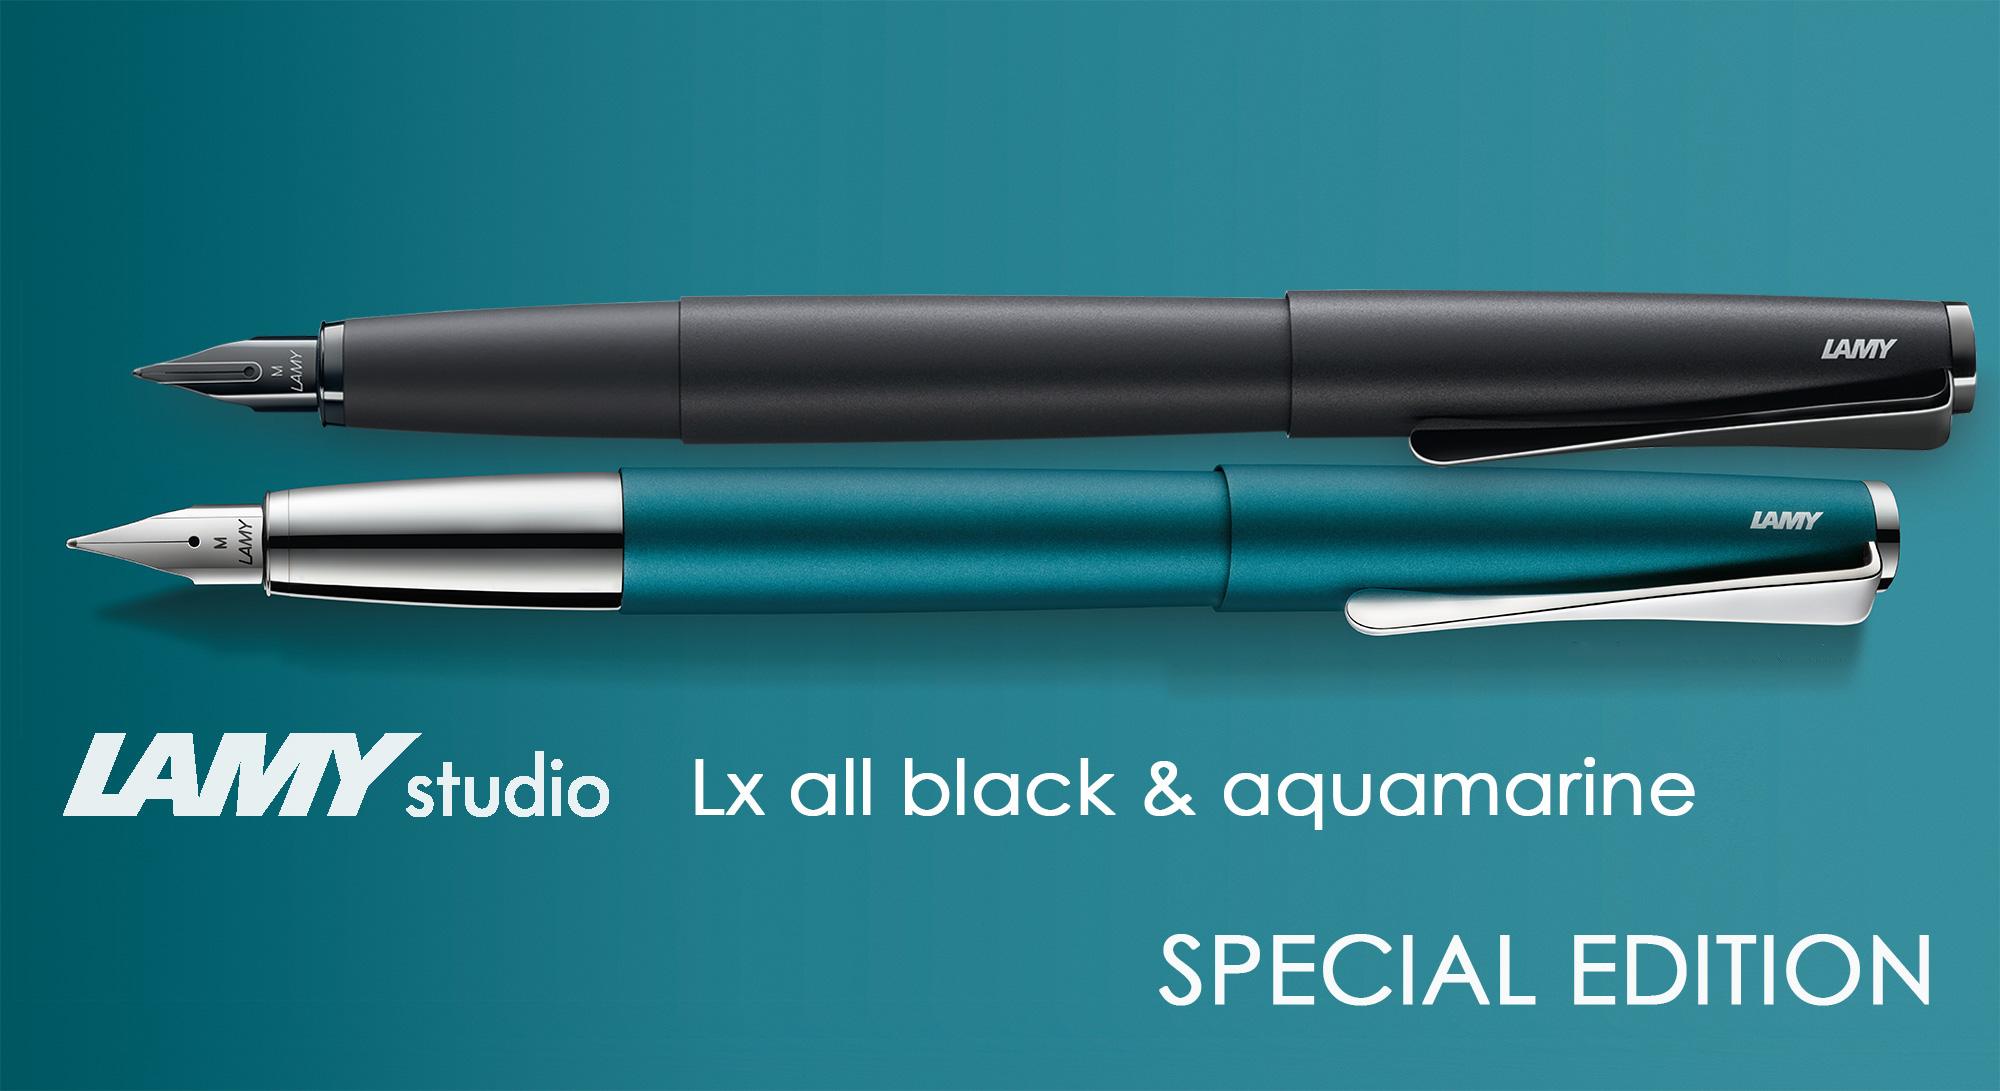 Lamy Studio Aquamarine and Lx All Black